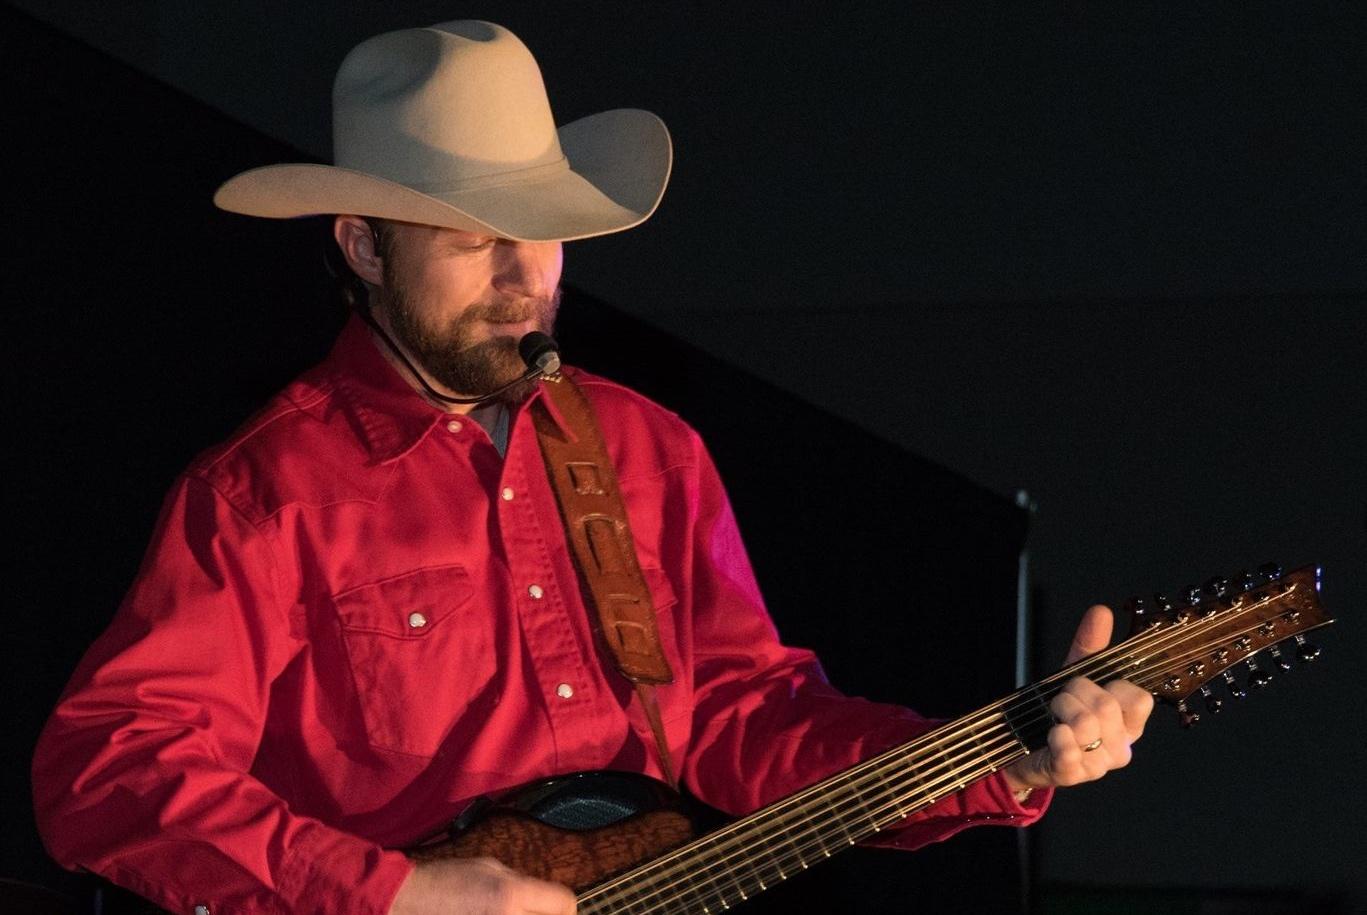 Camp Concert: Greg Hager